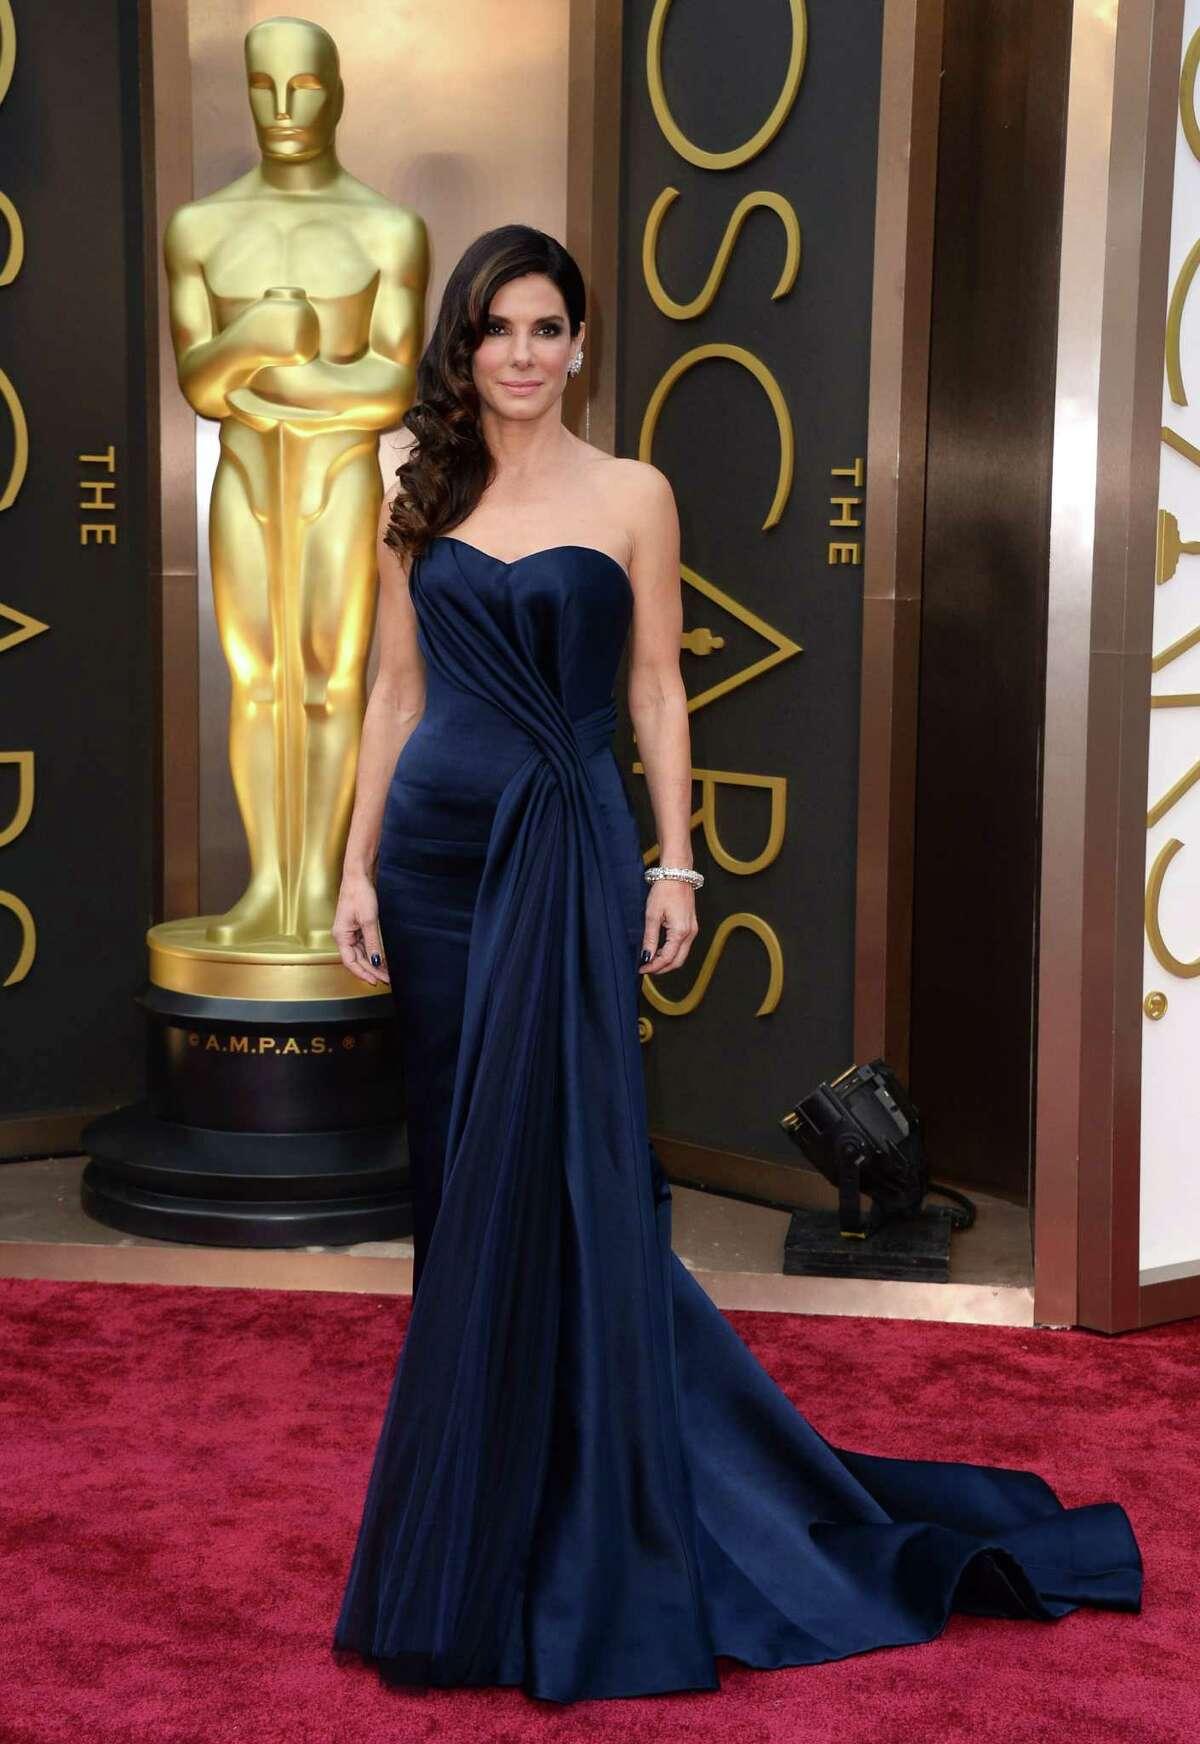 Sandra Bullock, actress, age 49:$63 million (est.). Source: Parade